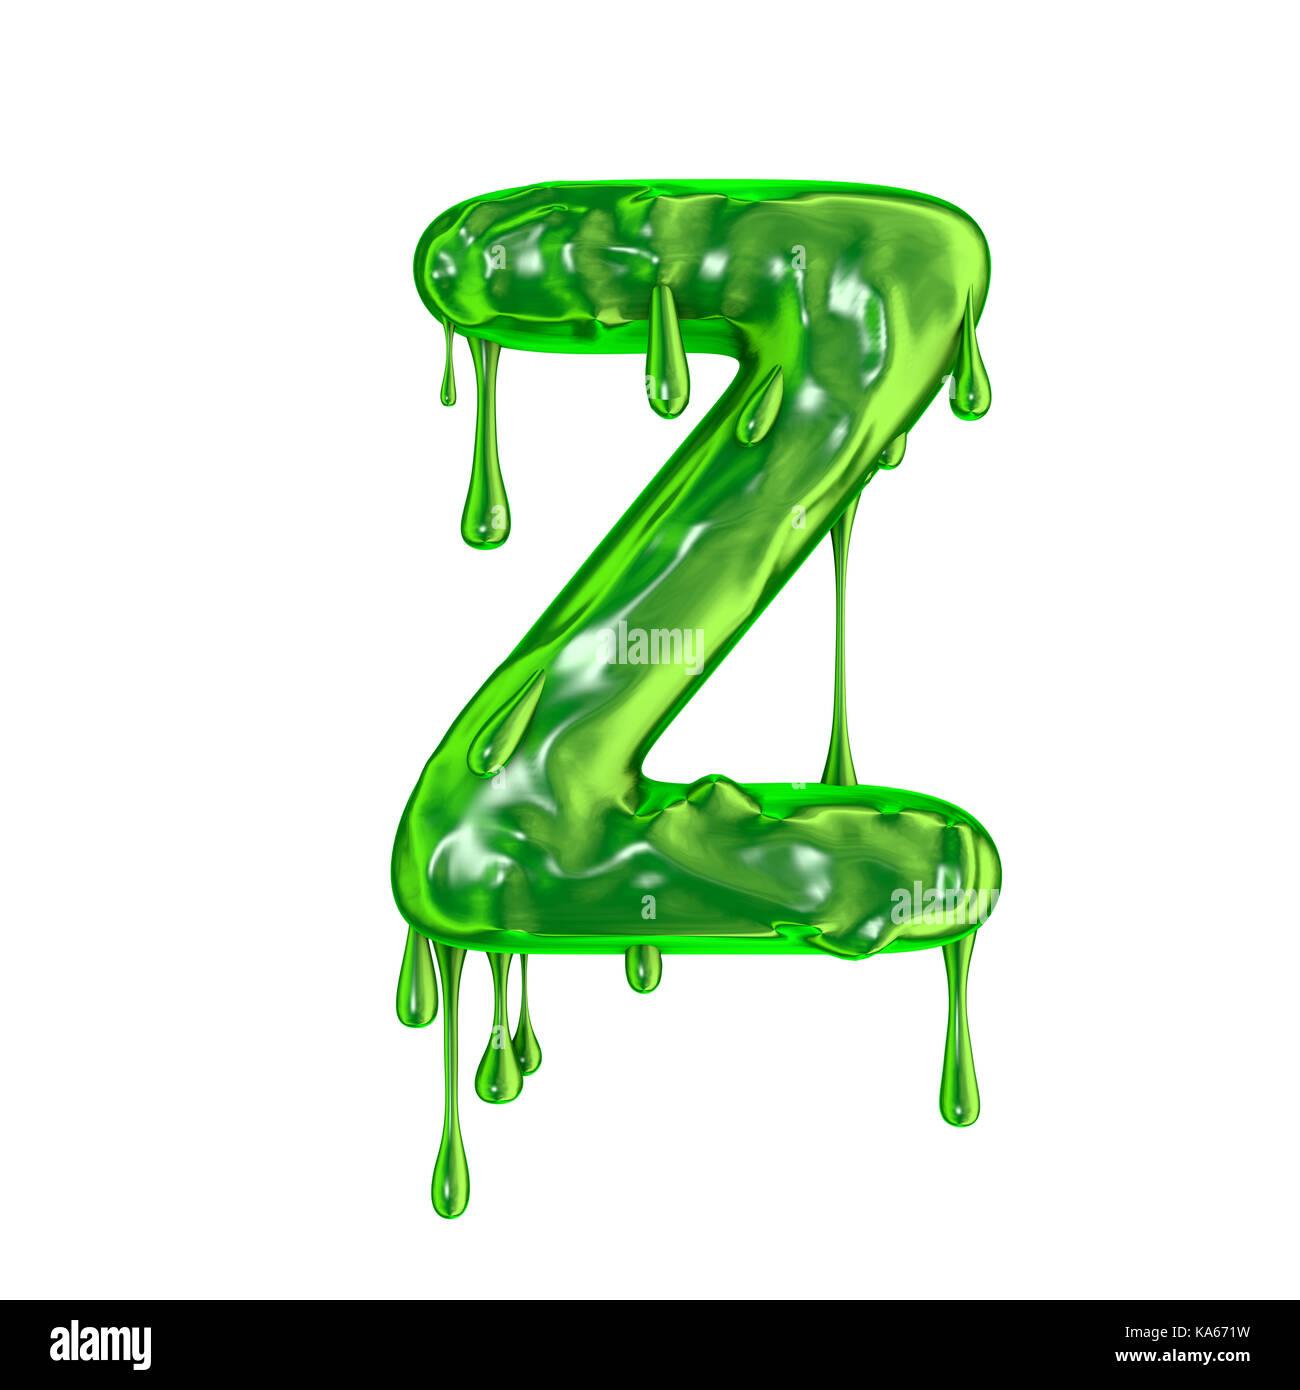 Green Dripping Slime Halloween Capital Letter Z Stock